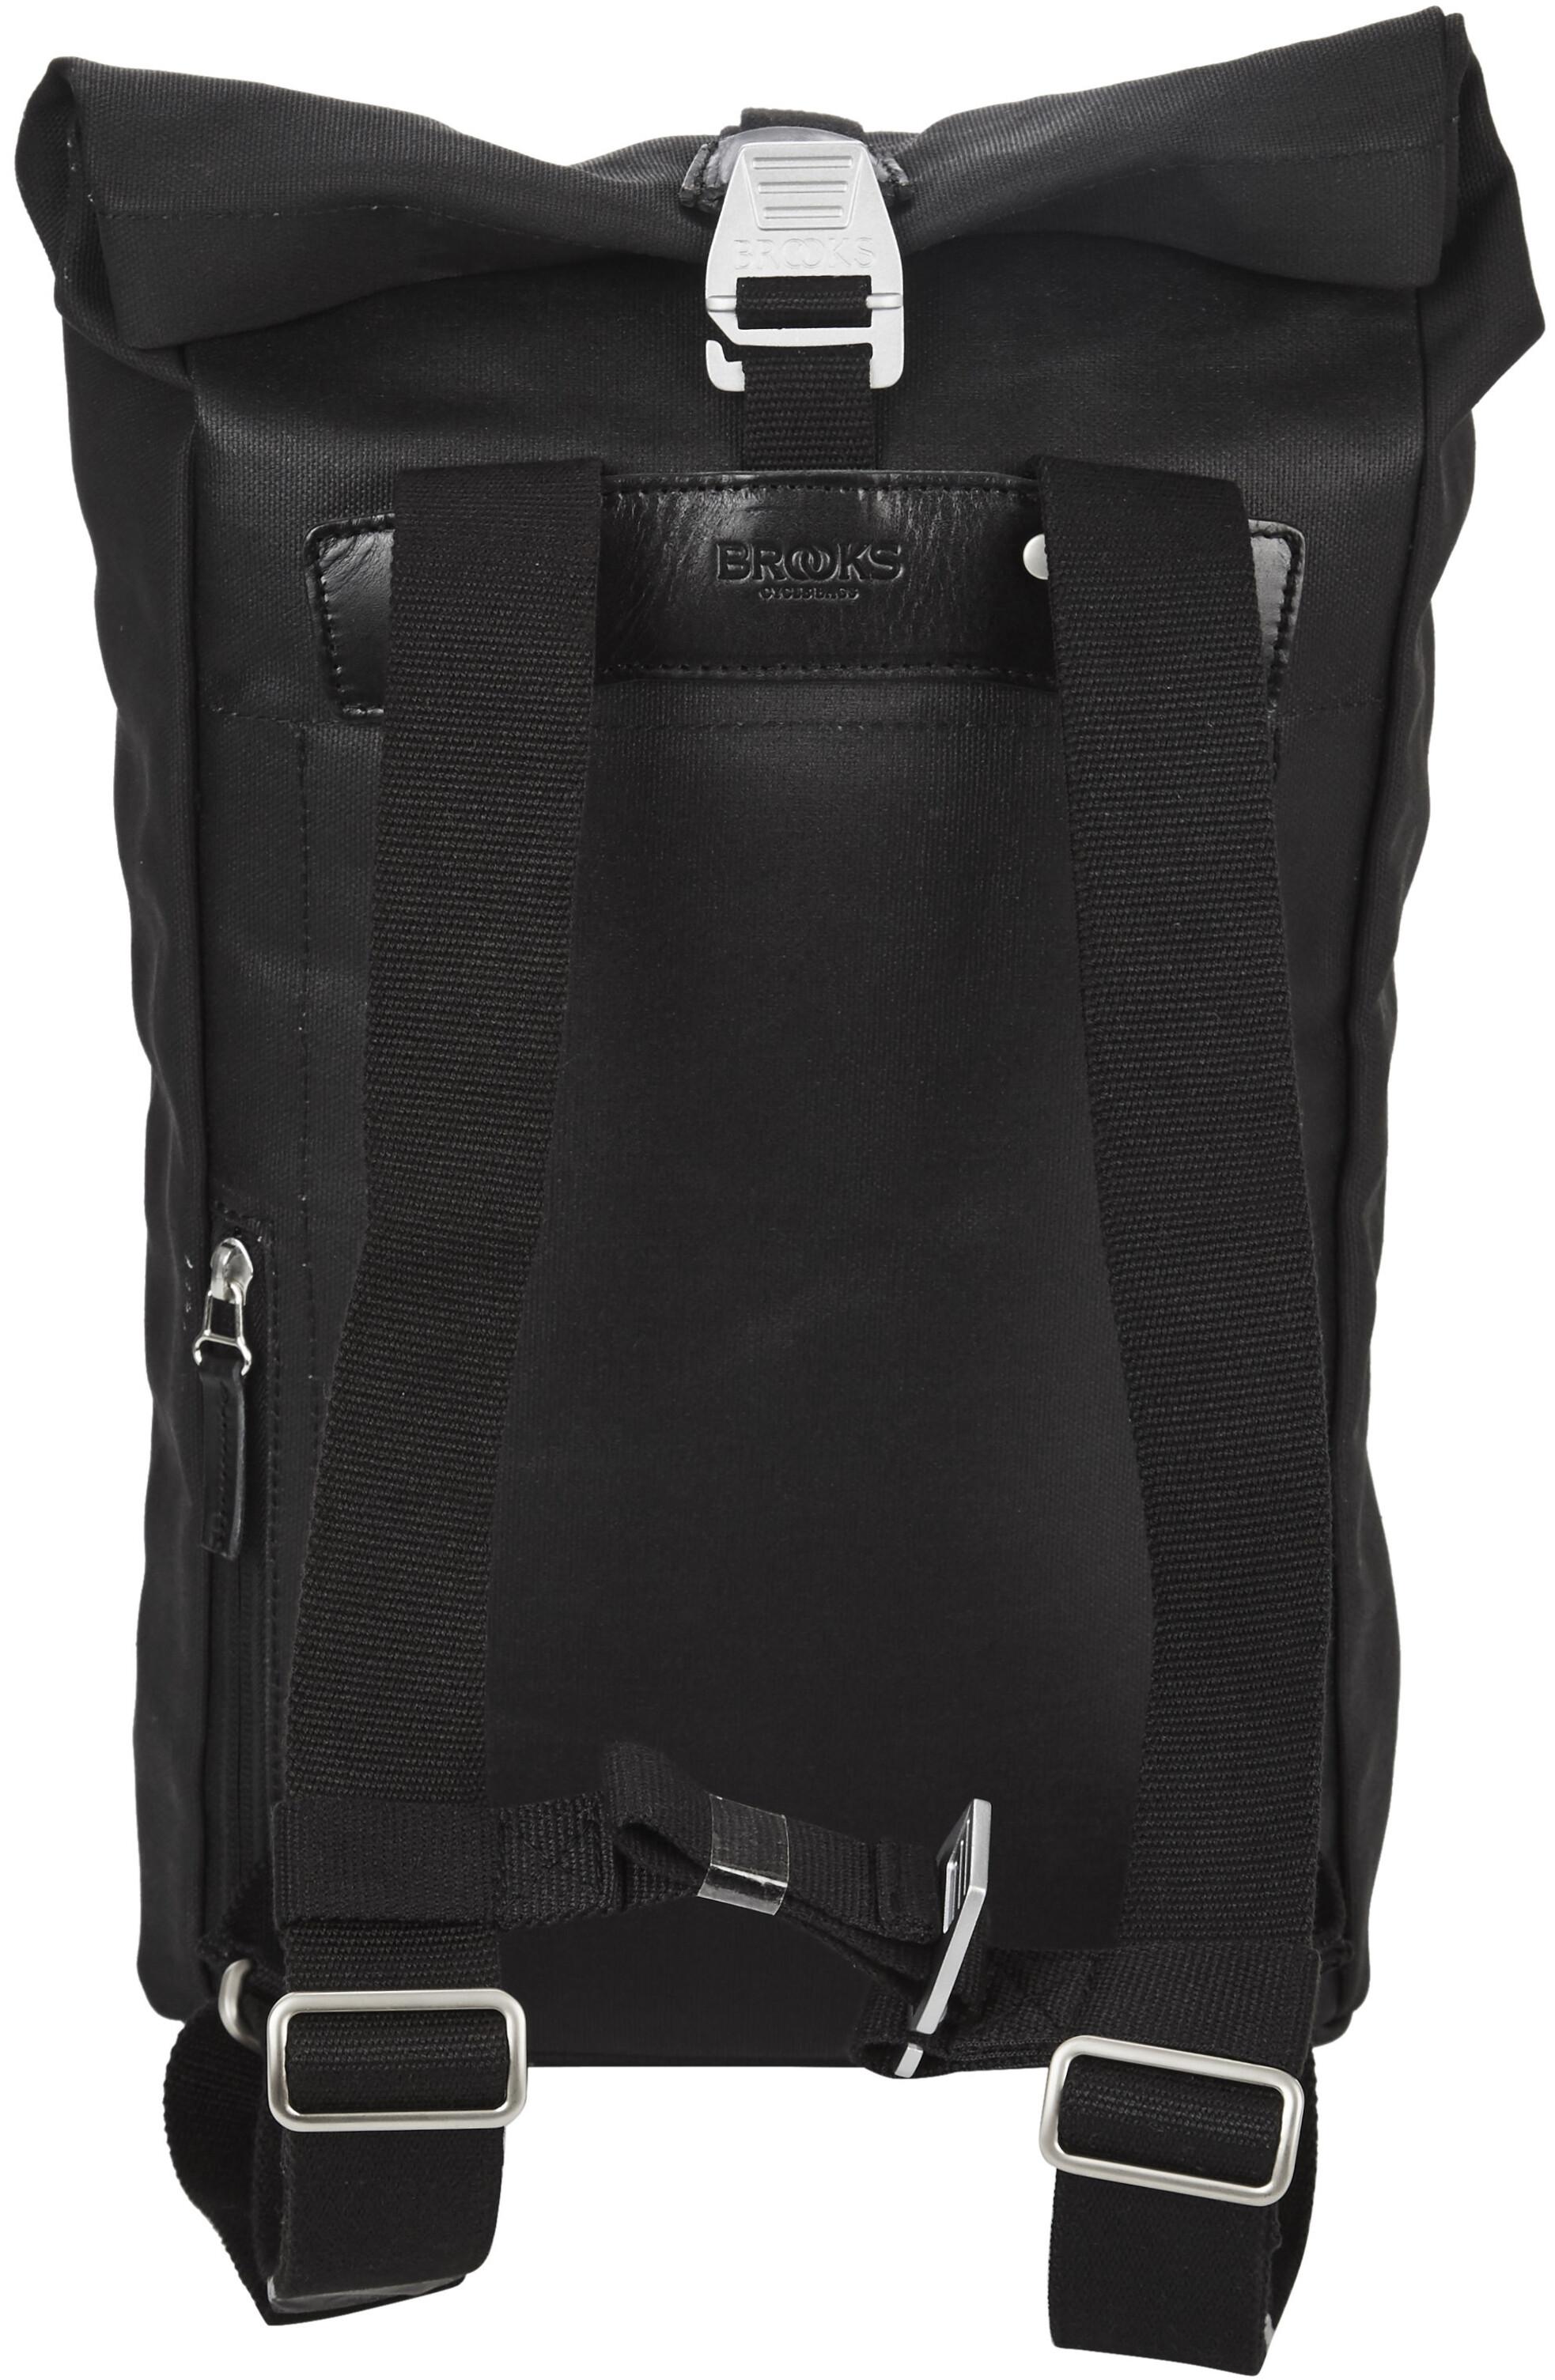 c17acbf54f4 Brooks Pickwick Canvas Backpack Small 12l black at Bikester.co.uk